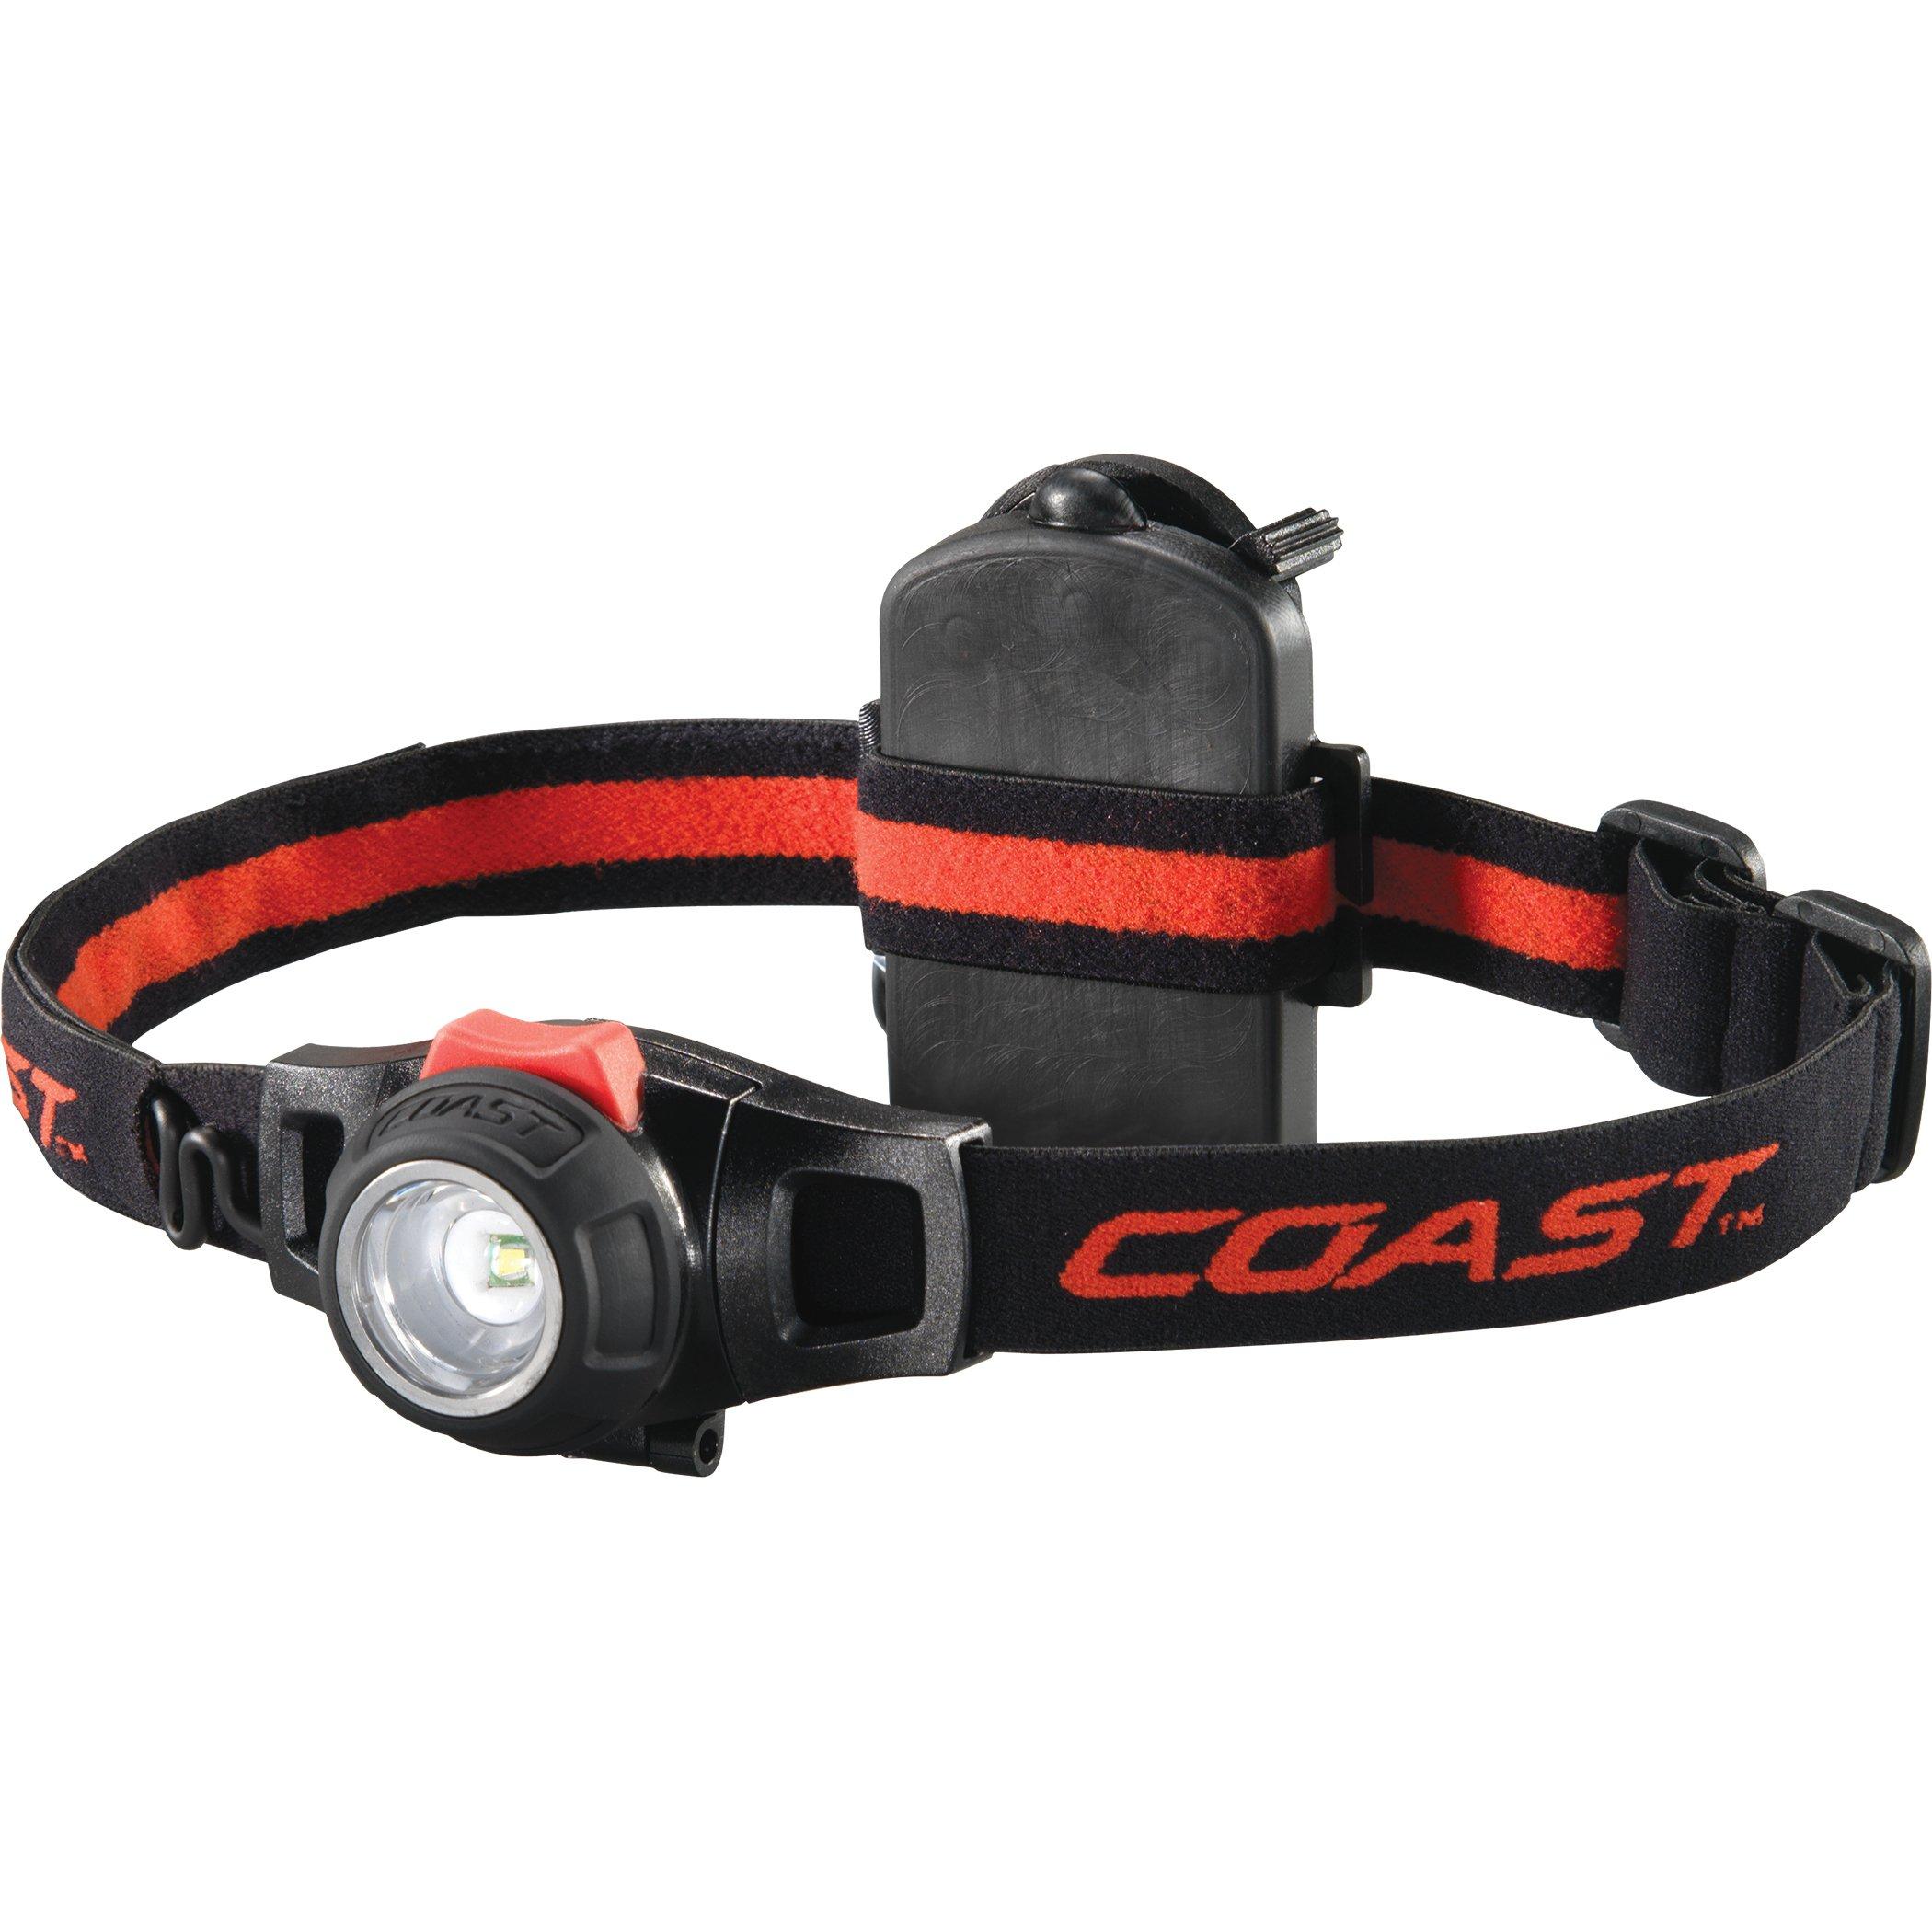 COAST HL7 19273 Lumen Focusing LED Headlamp with Twist Focus by Coast